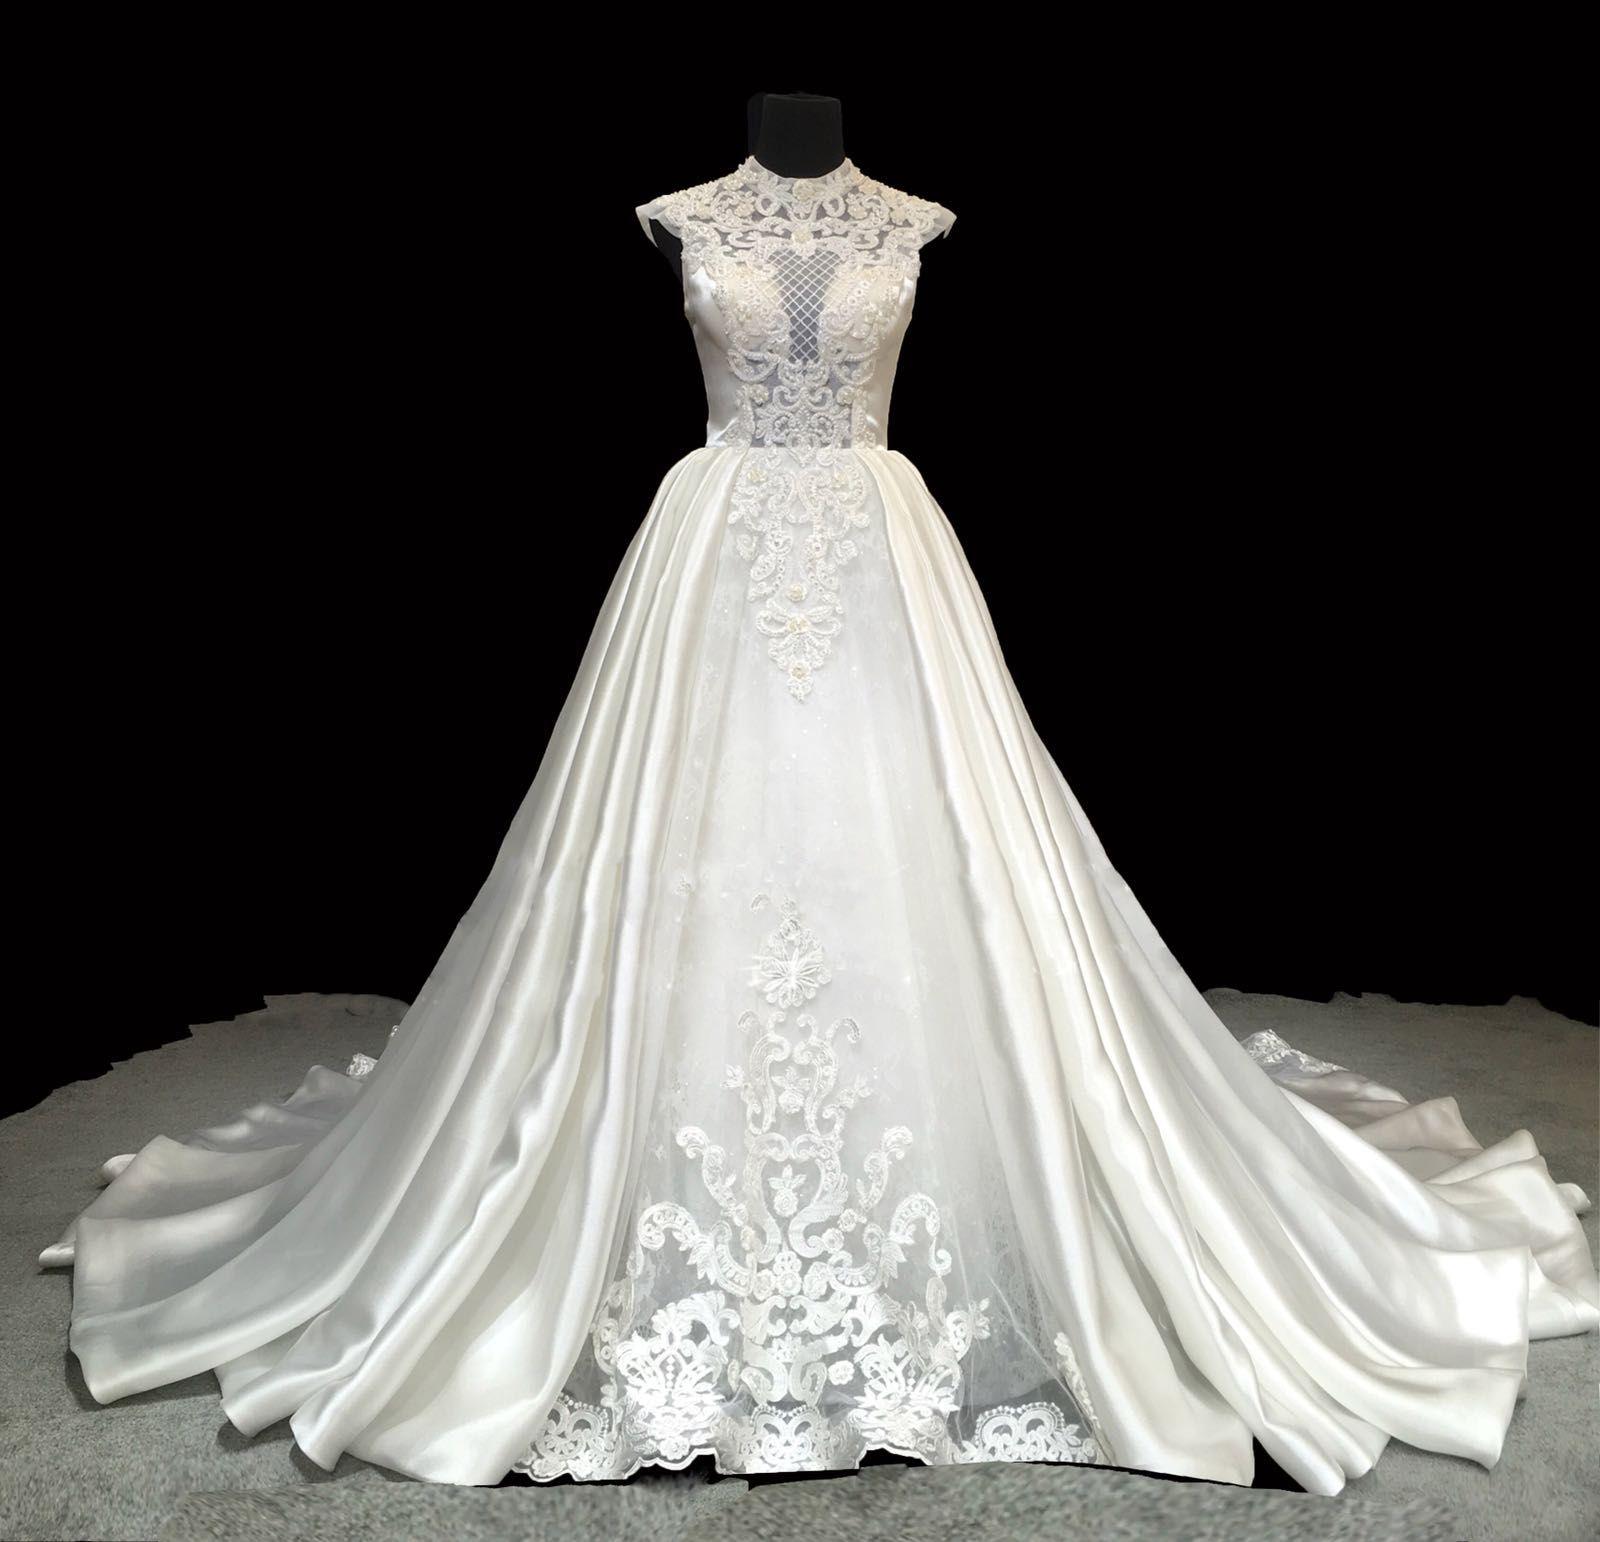 Wedding Dress Www.zaramakes.com #boltonbridalboutique